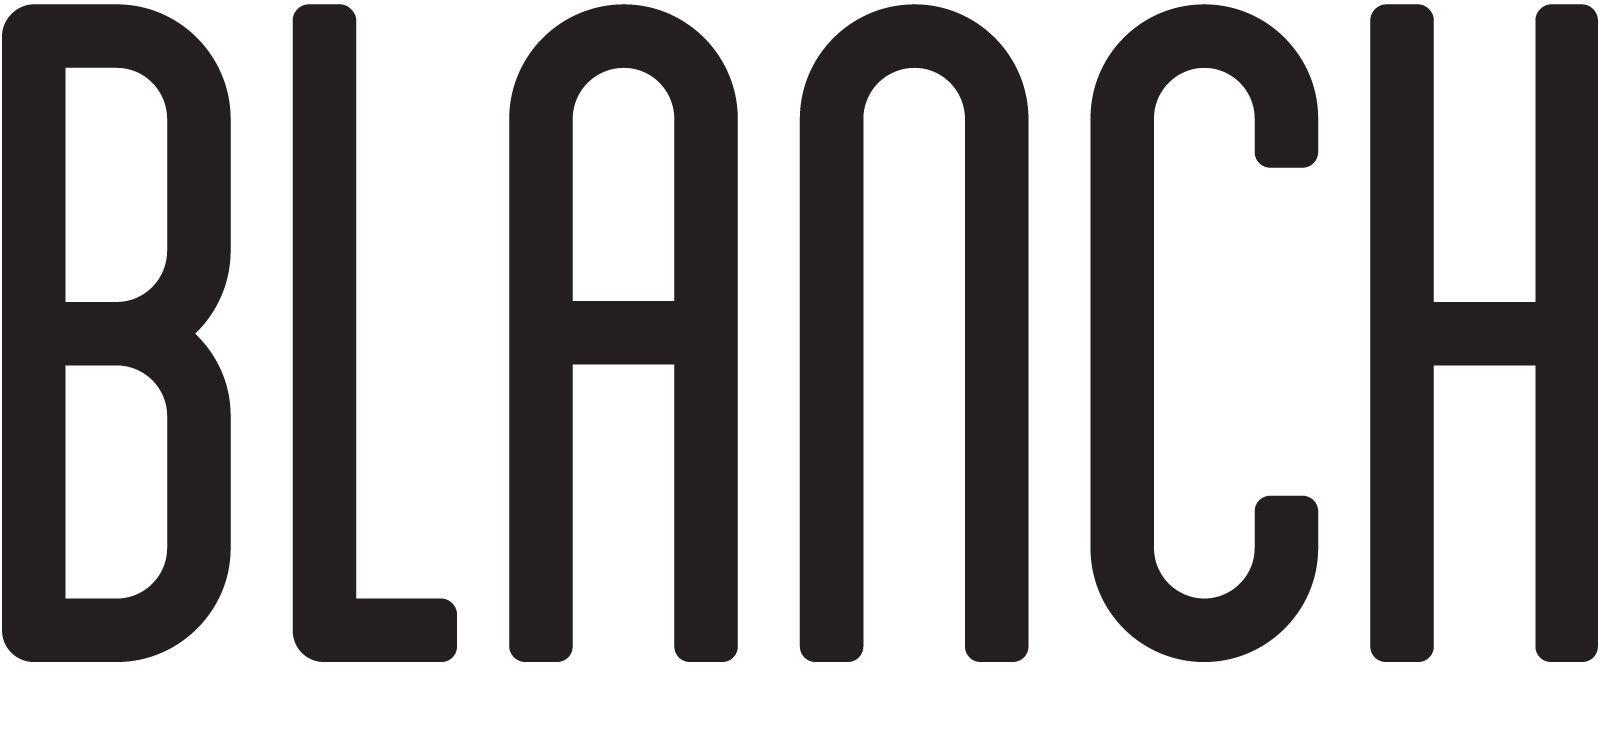 Atipus blanch font 01 type pinterest atipus blanch font 01 stopboris Image collections